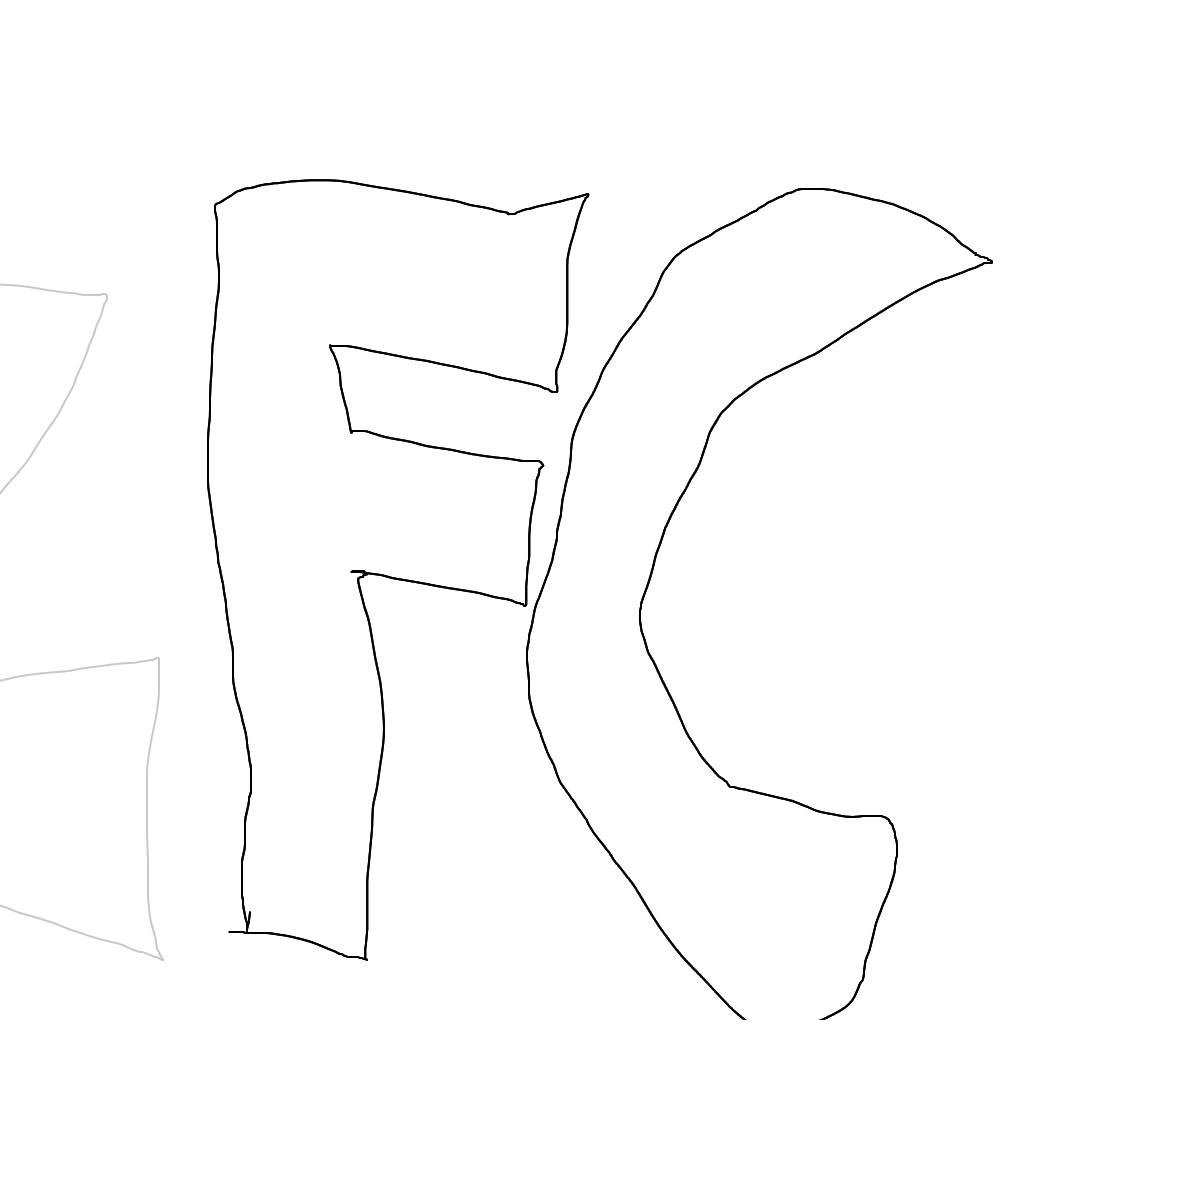 BAAAM drawing#8253 lat:48.8718986511230500lng: 2.3176777362823486